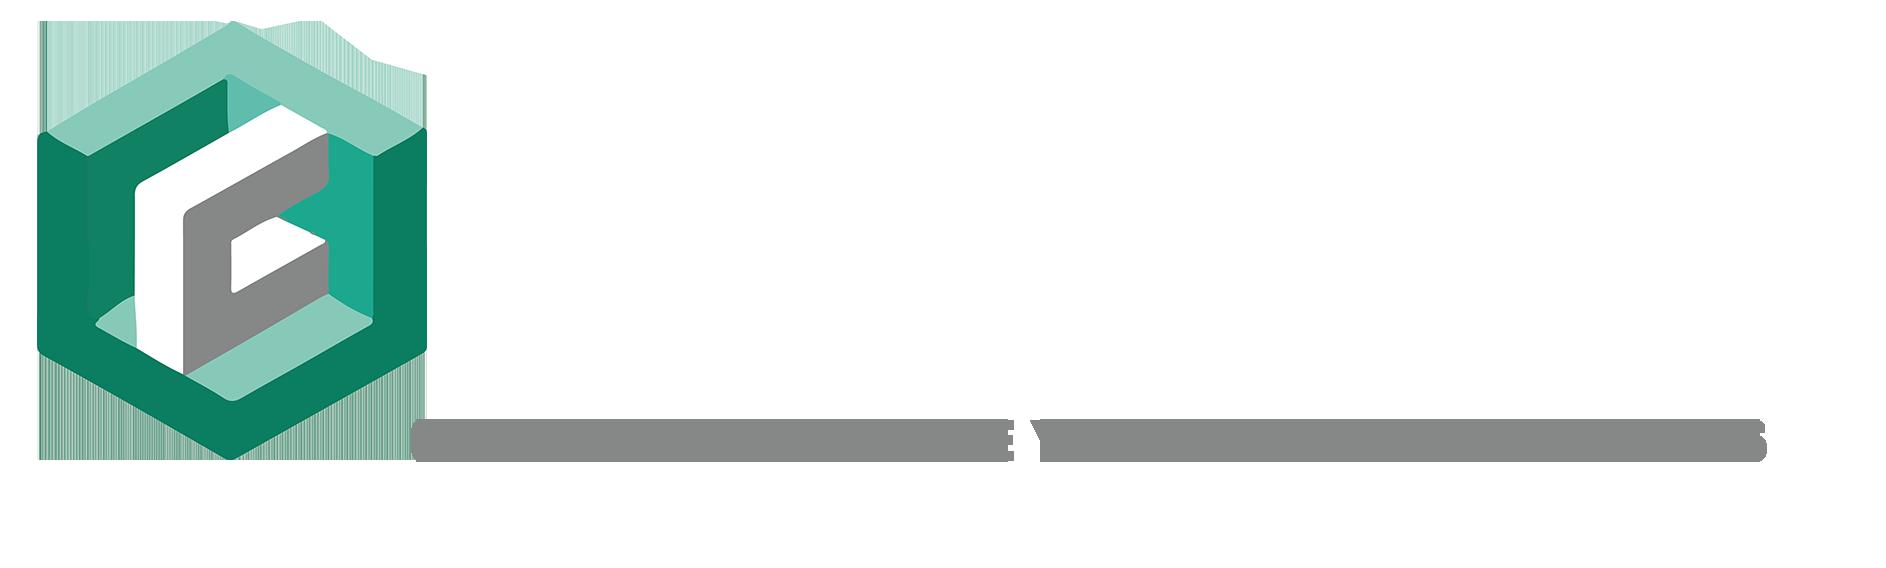 concretease-proto